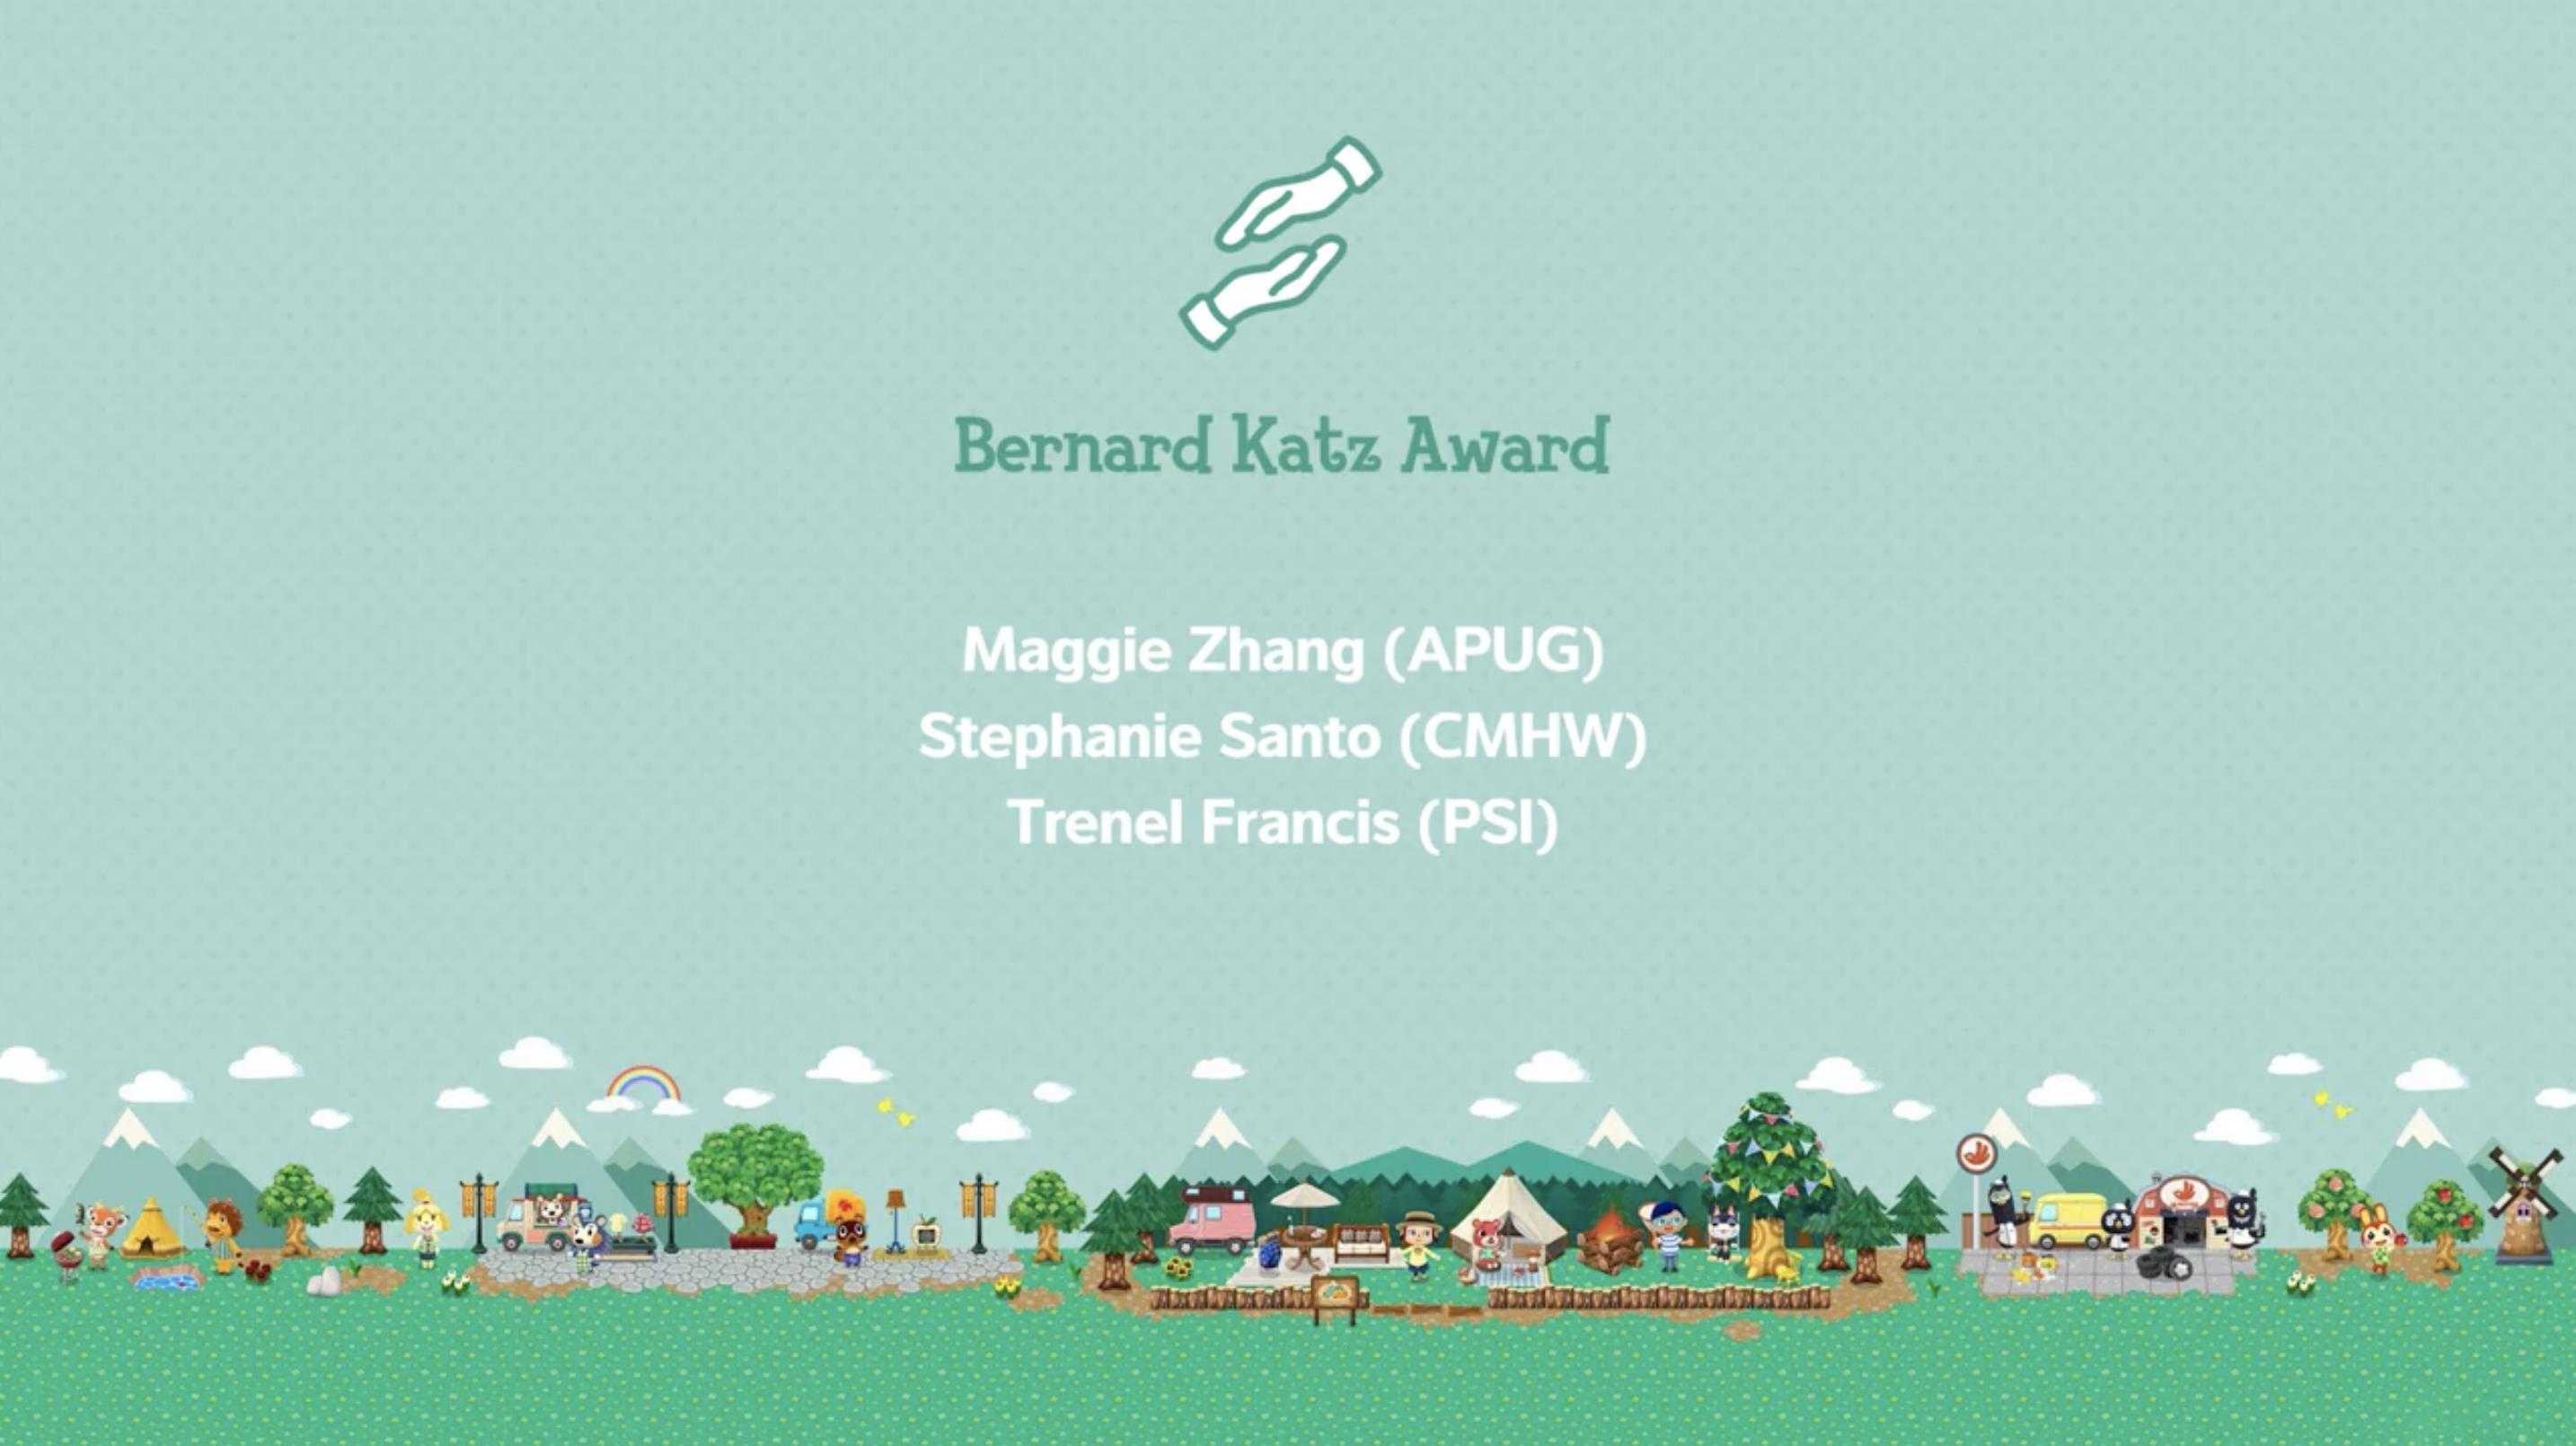 RA Maggie Zhang Wins the Bernard Katz Award!